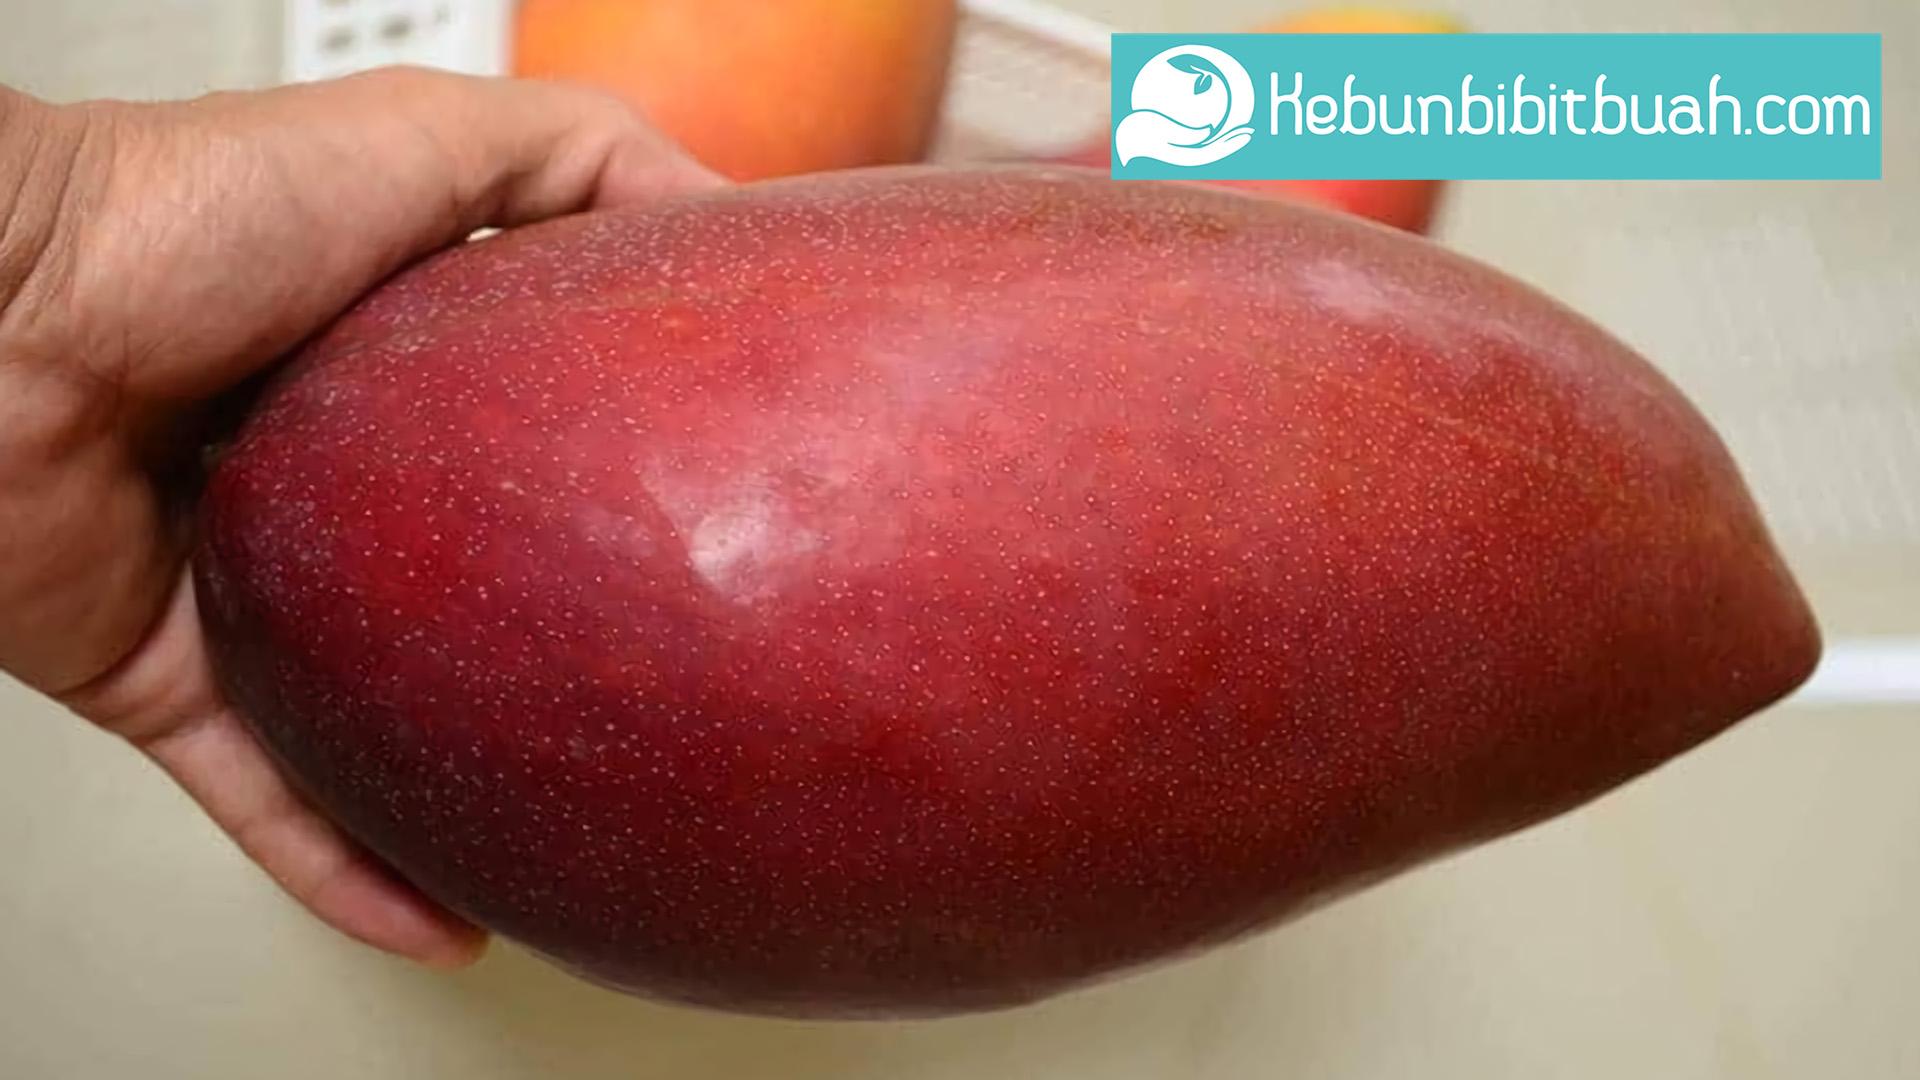 buah mangga jin xing kebun bibit buah